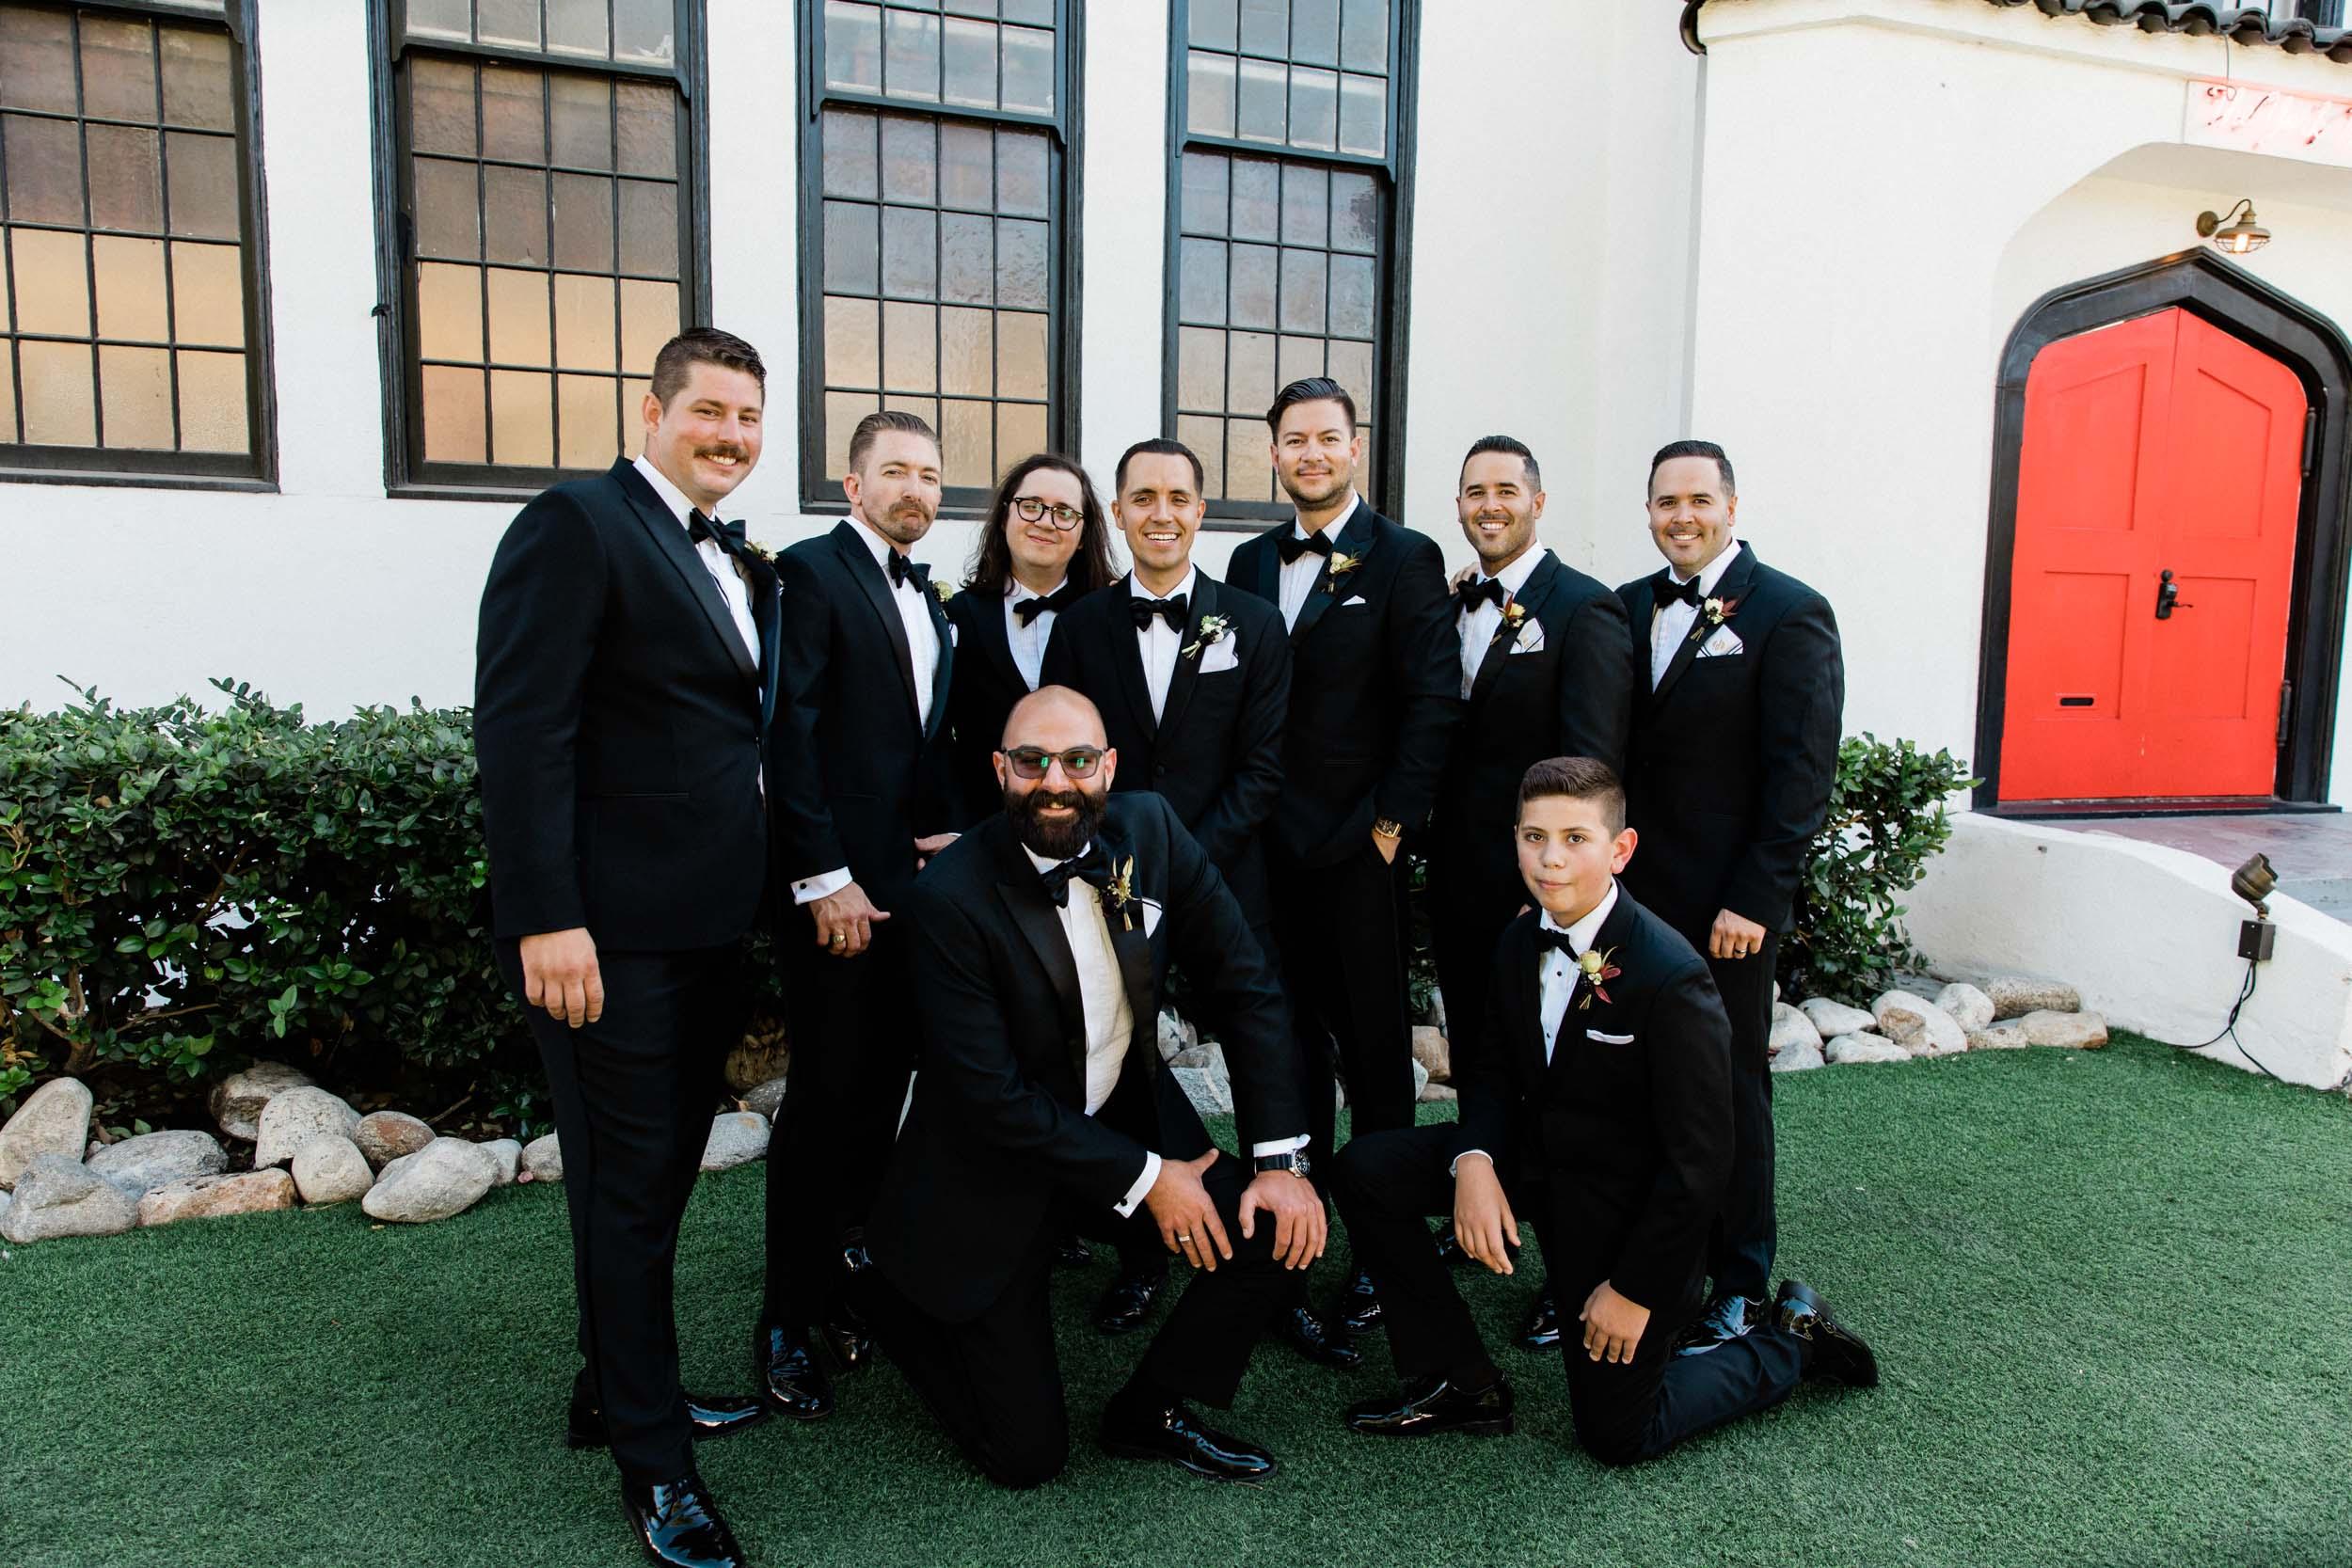 BKM-Photography-Los-Angeles-Highland-Park-York-Manor-Wedding-Photography-0564.jpg